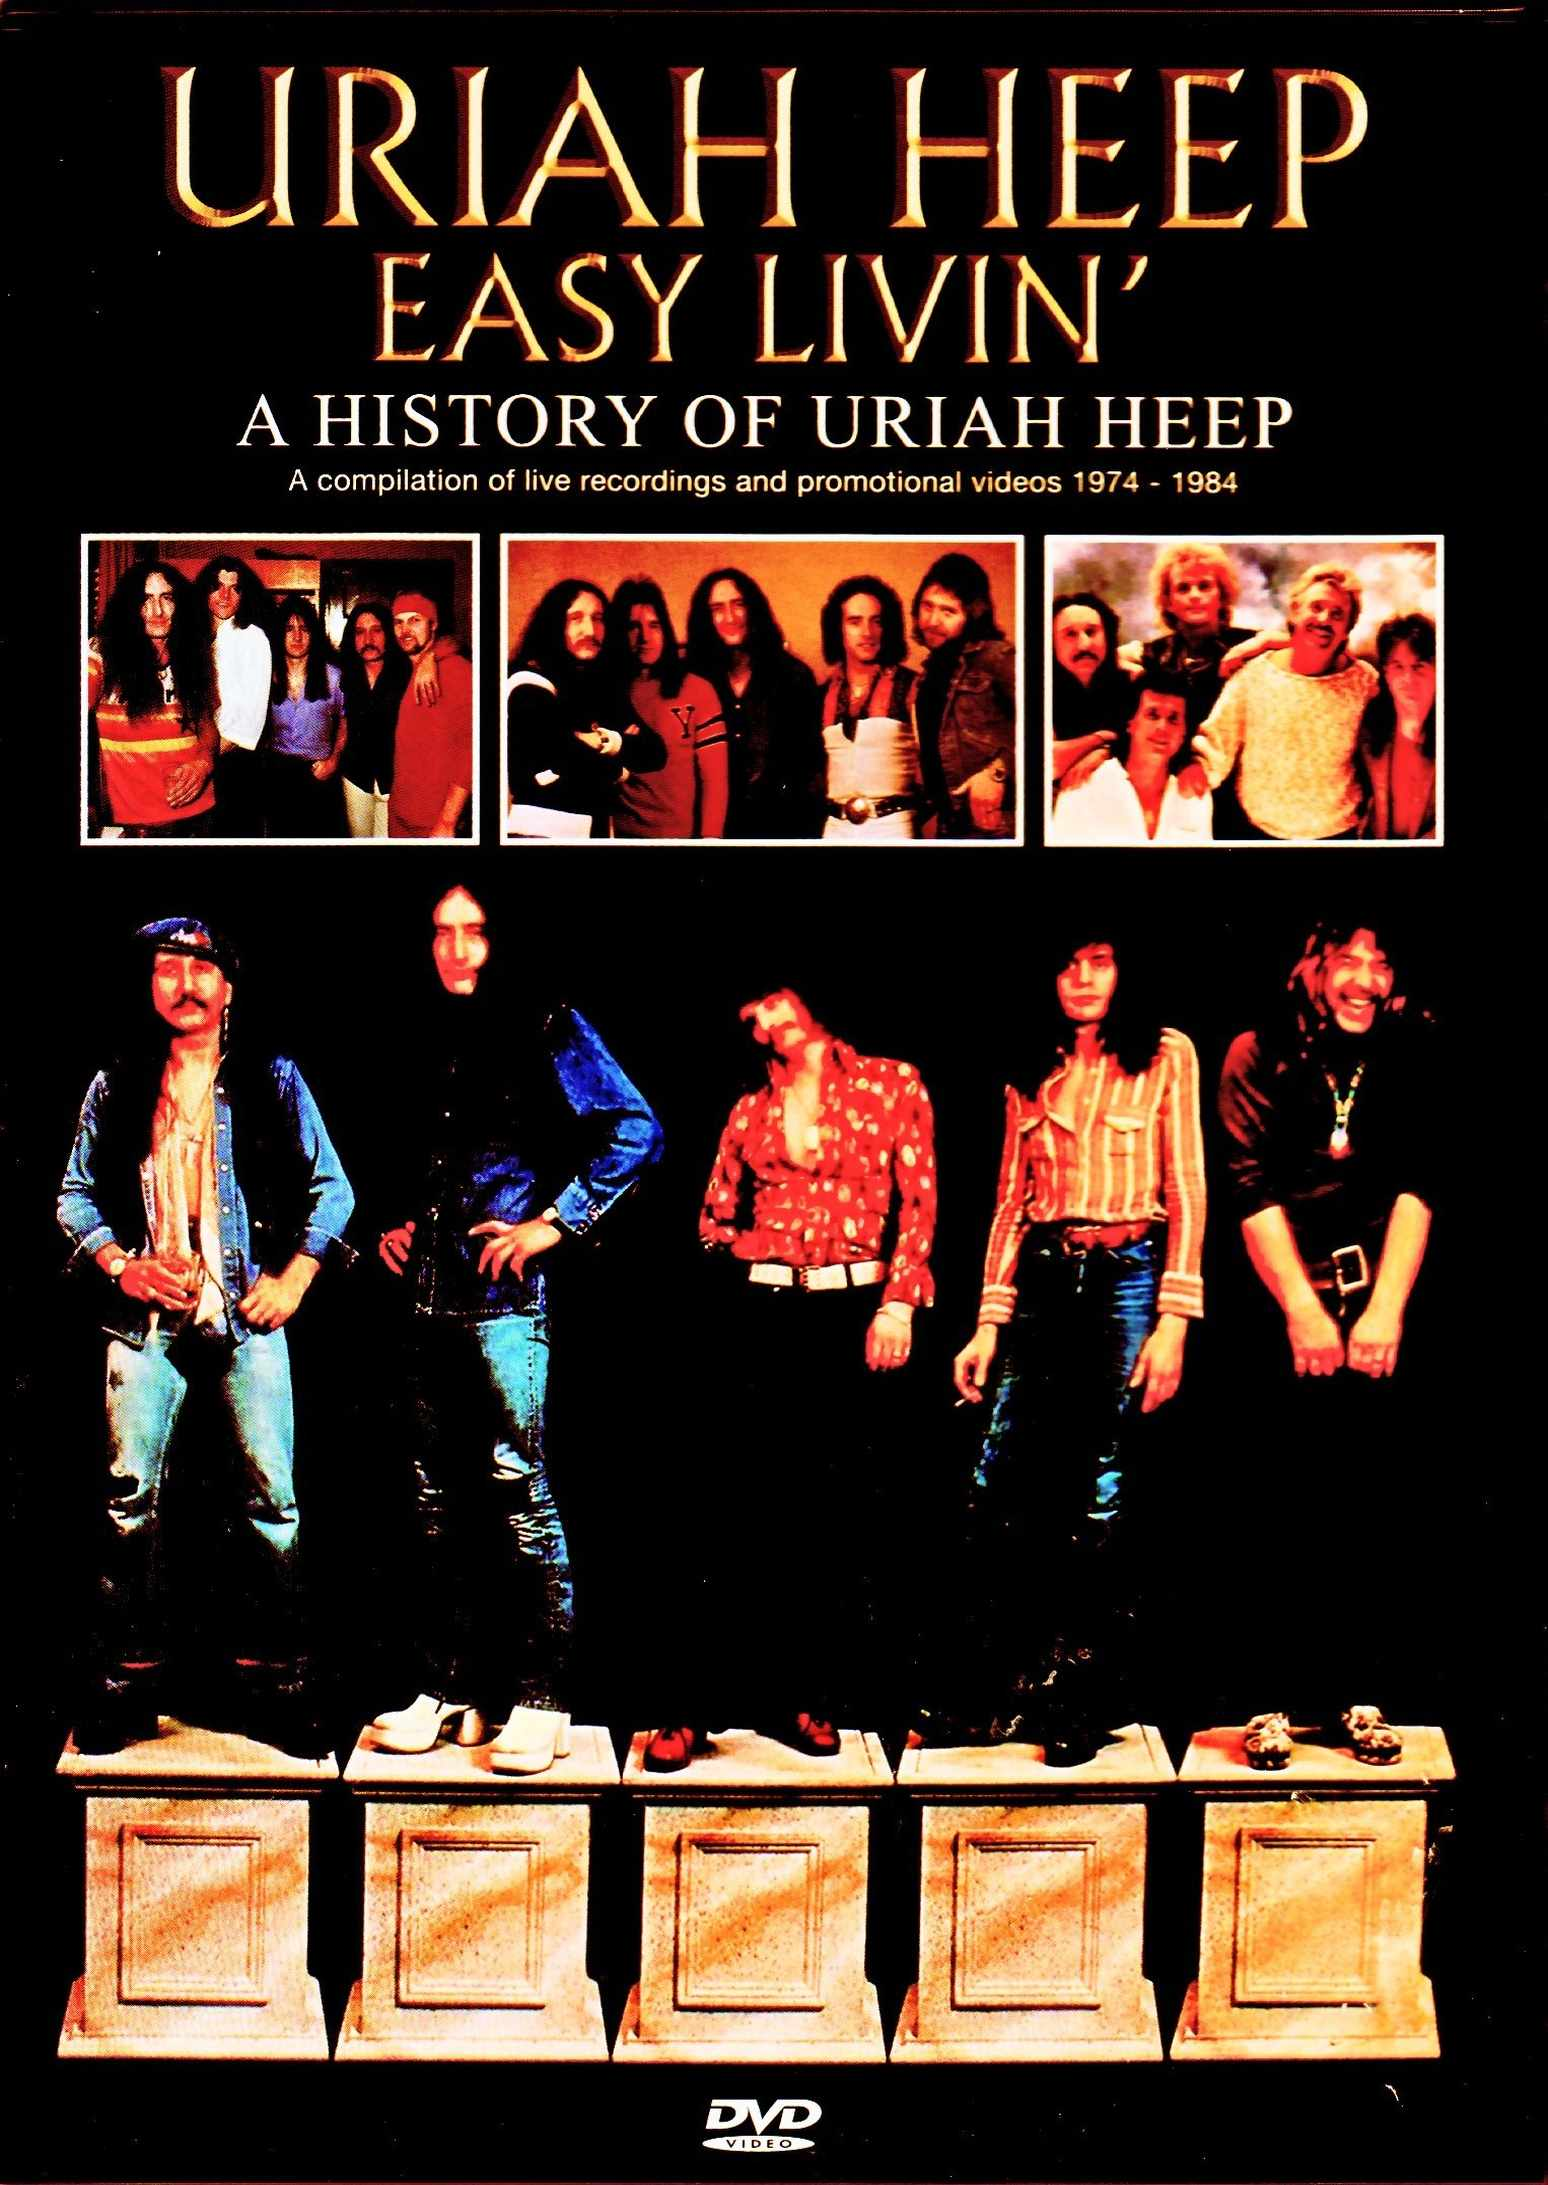 Uriah Heep ユーライア・ヒープ/ユーライア・ヒープの歴史 A History of Uriah Heep Japanese LD Edition